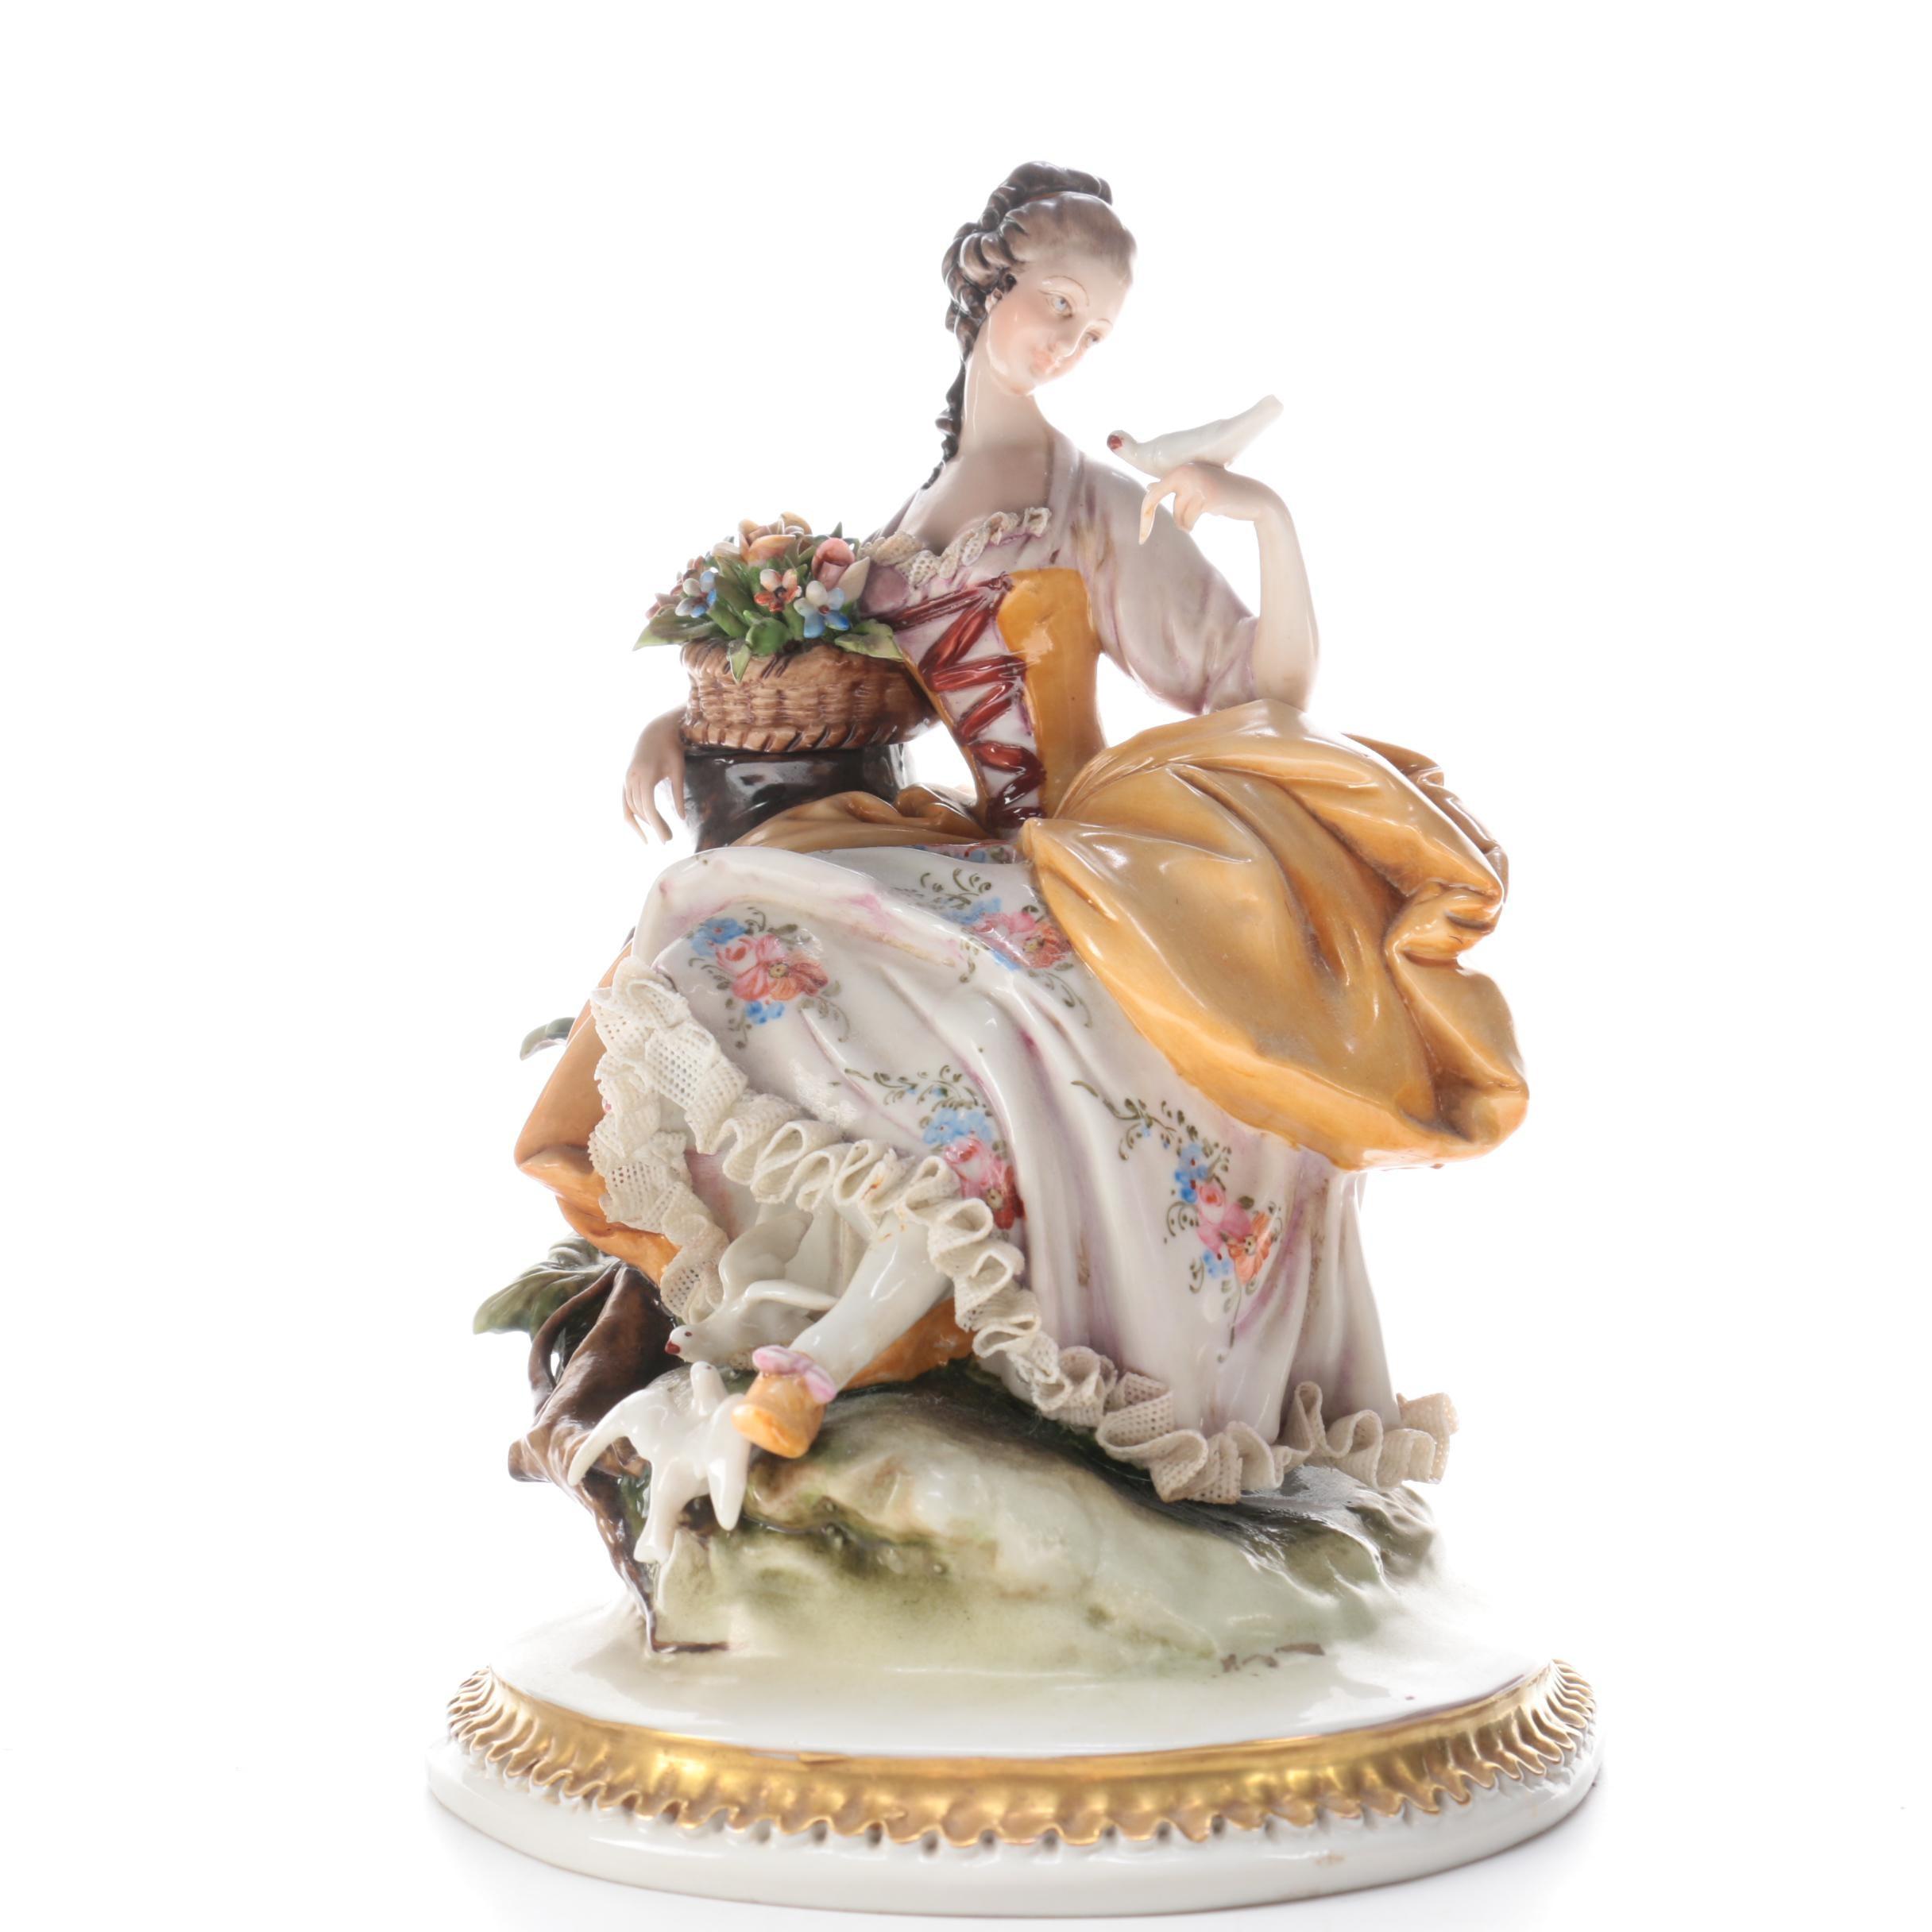 Works of Art Italian Porcelain Figurine